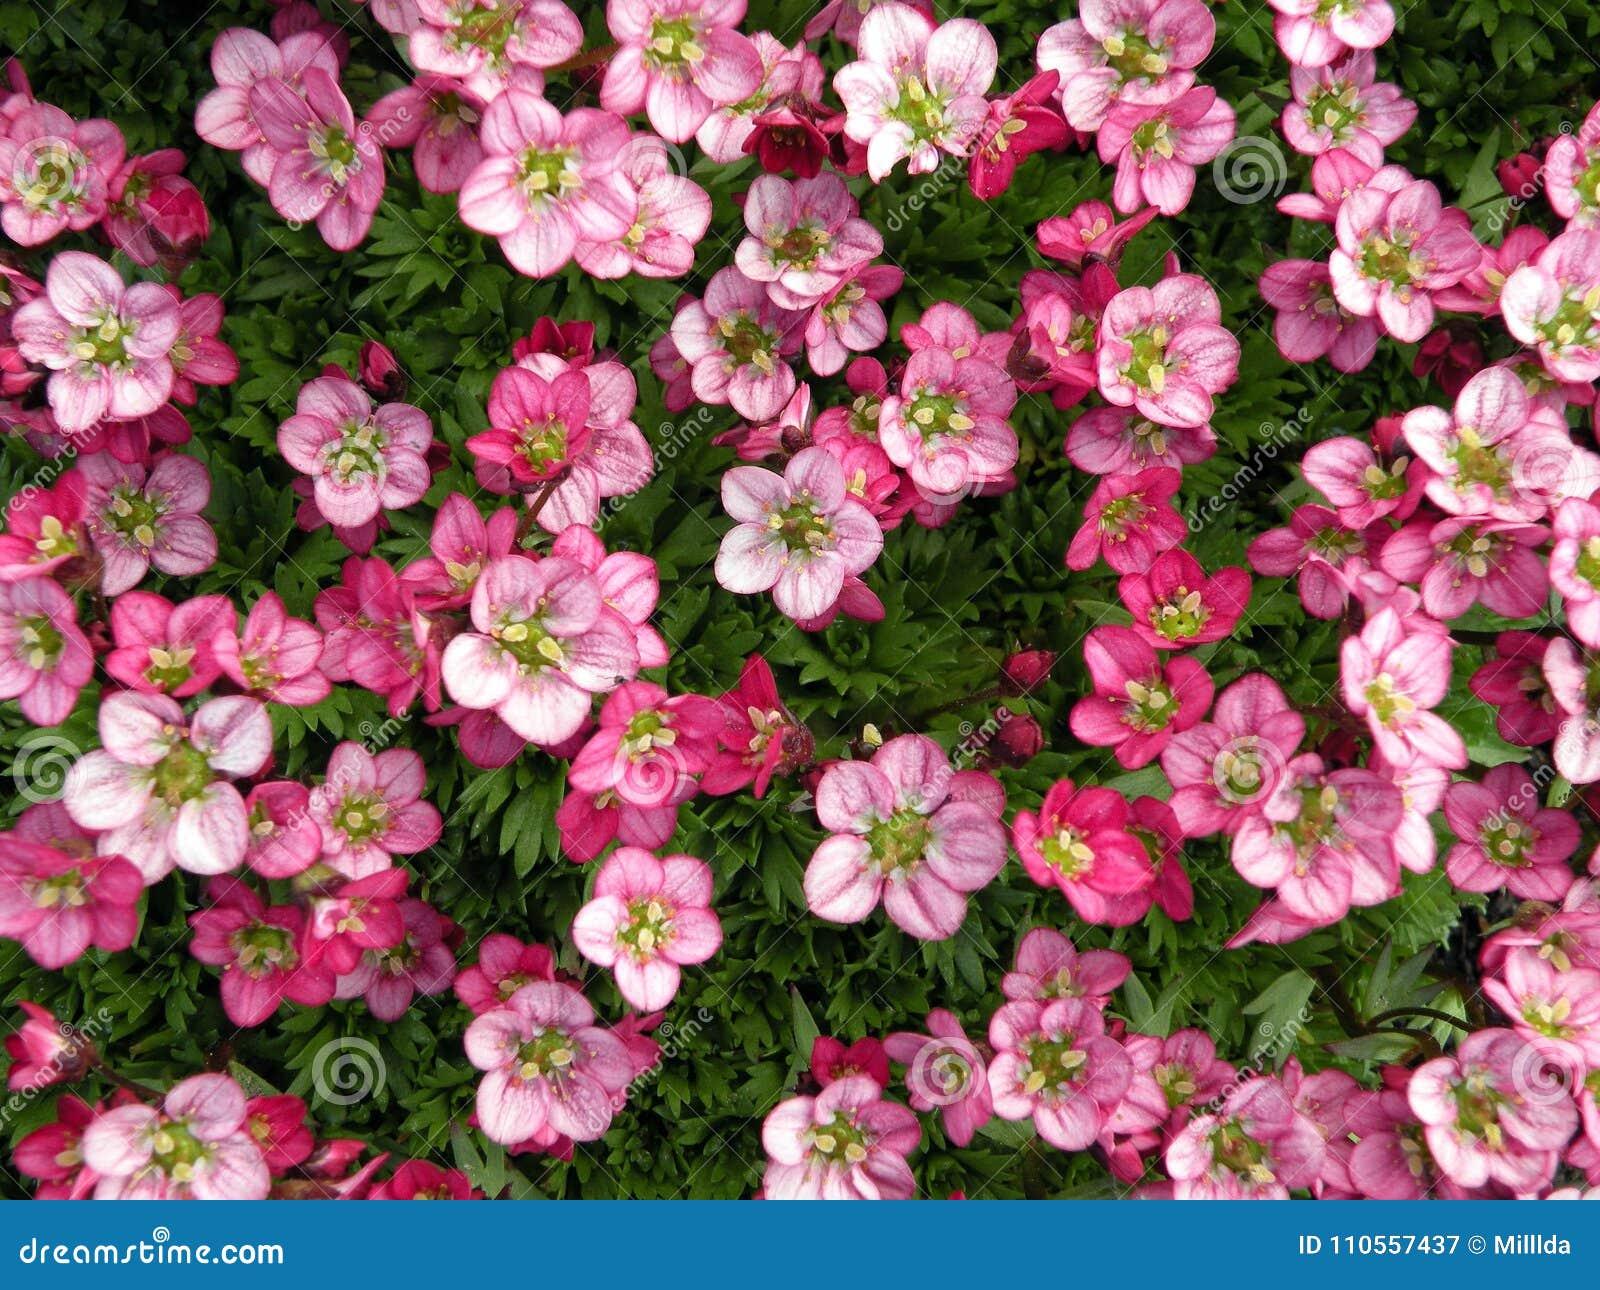 Beautiful pink flowers in garden lithuania stock image image of beautiful pink flowers in garden lithuania mightylinksfo